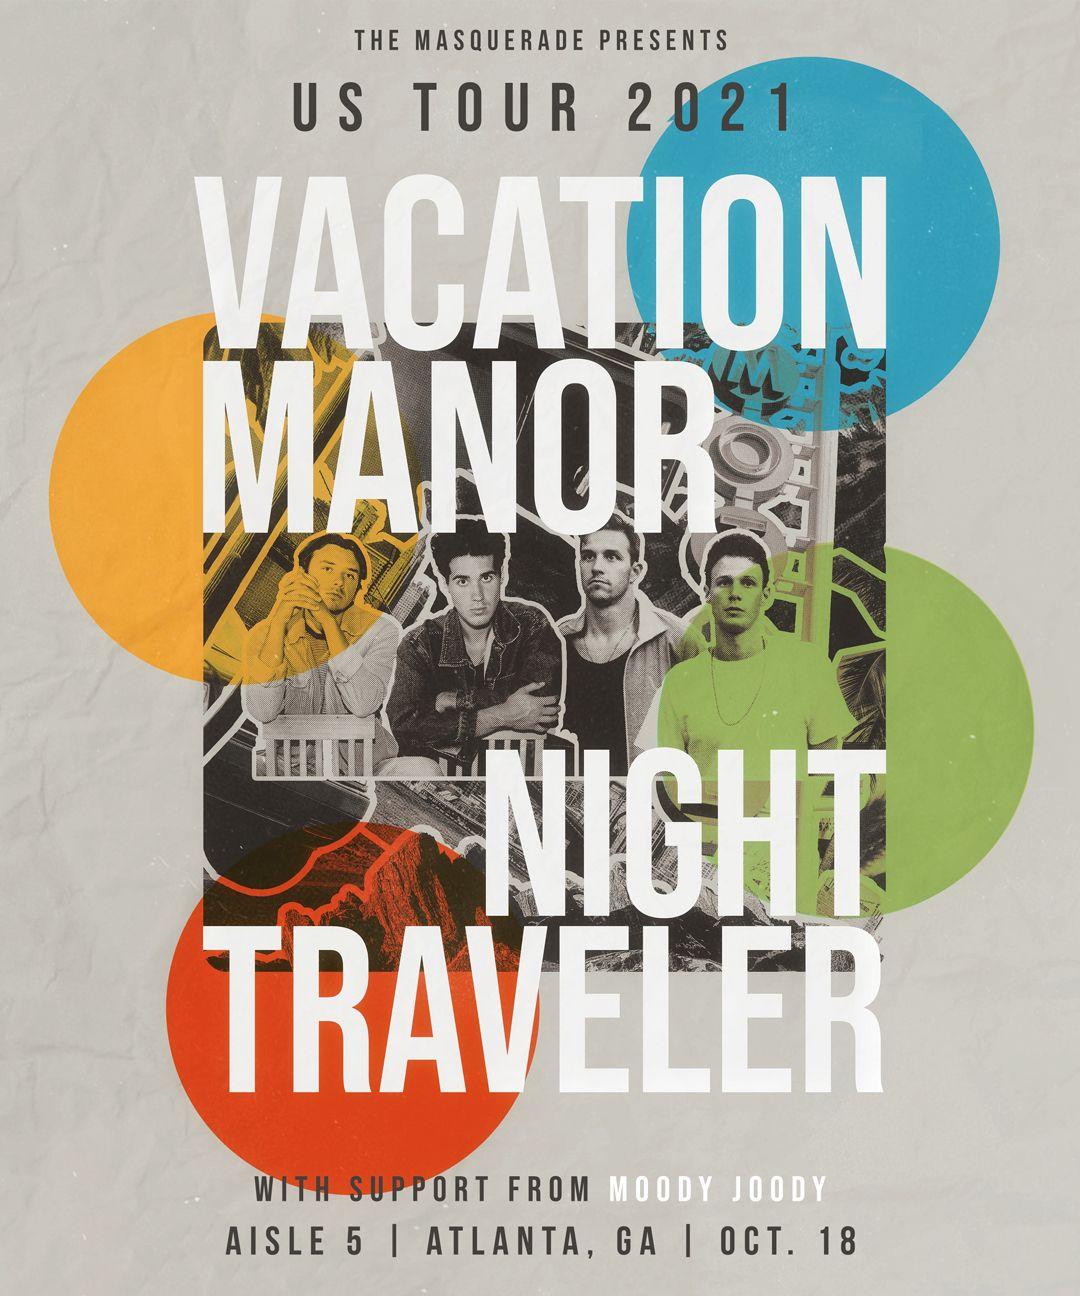 Vacation Manor, Night Traveler